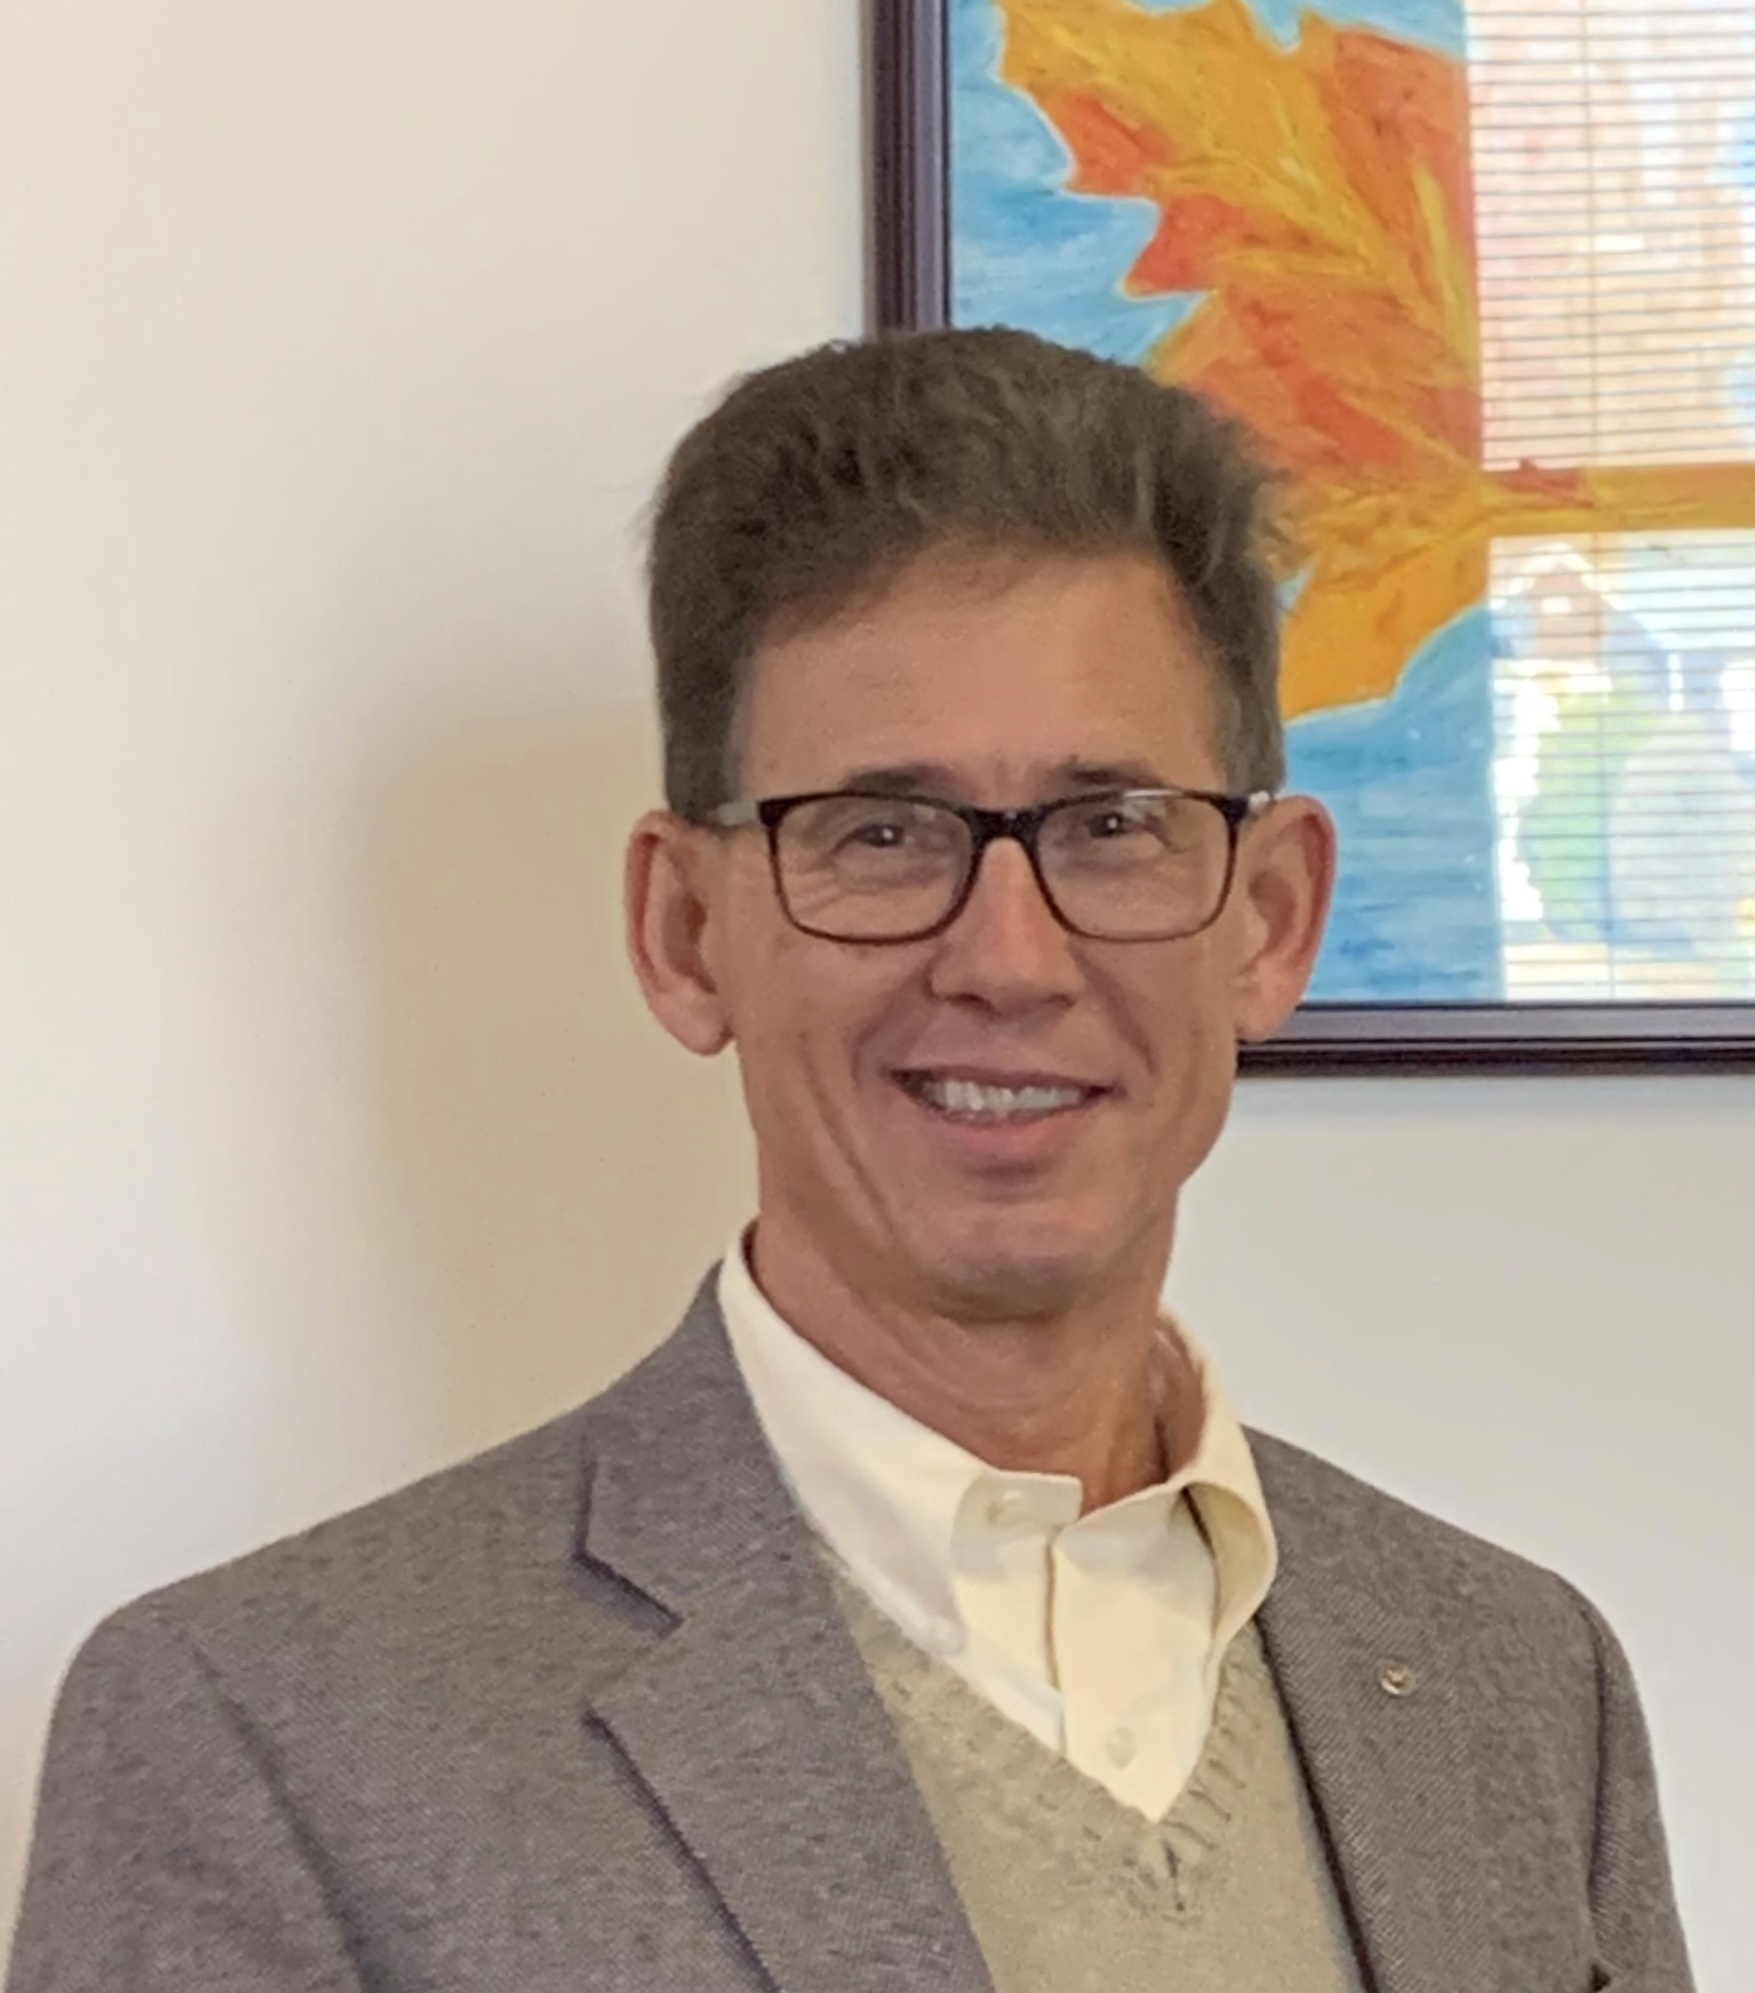 Lexington hires new city manager